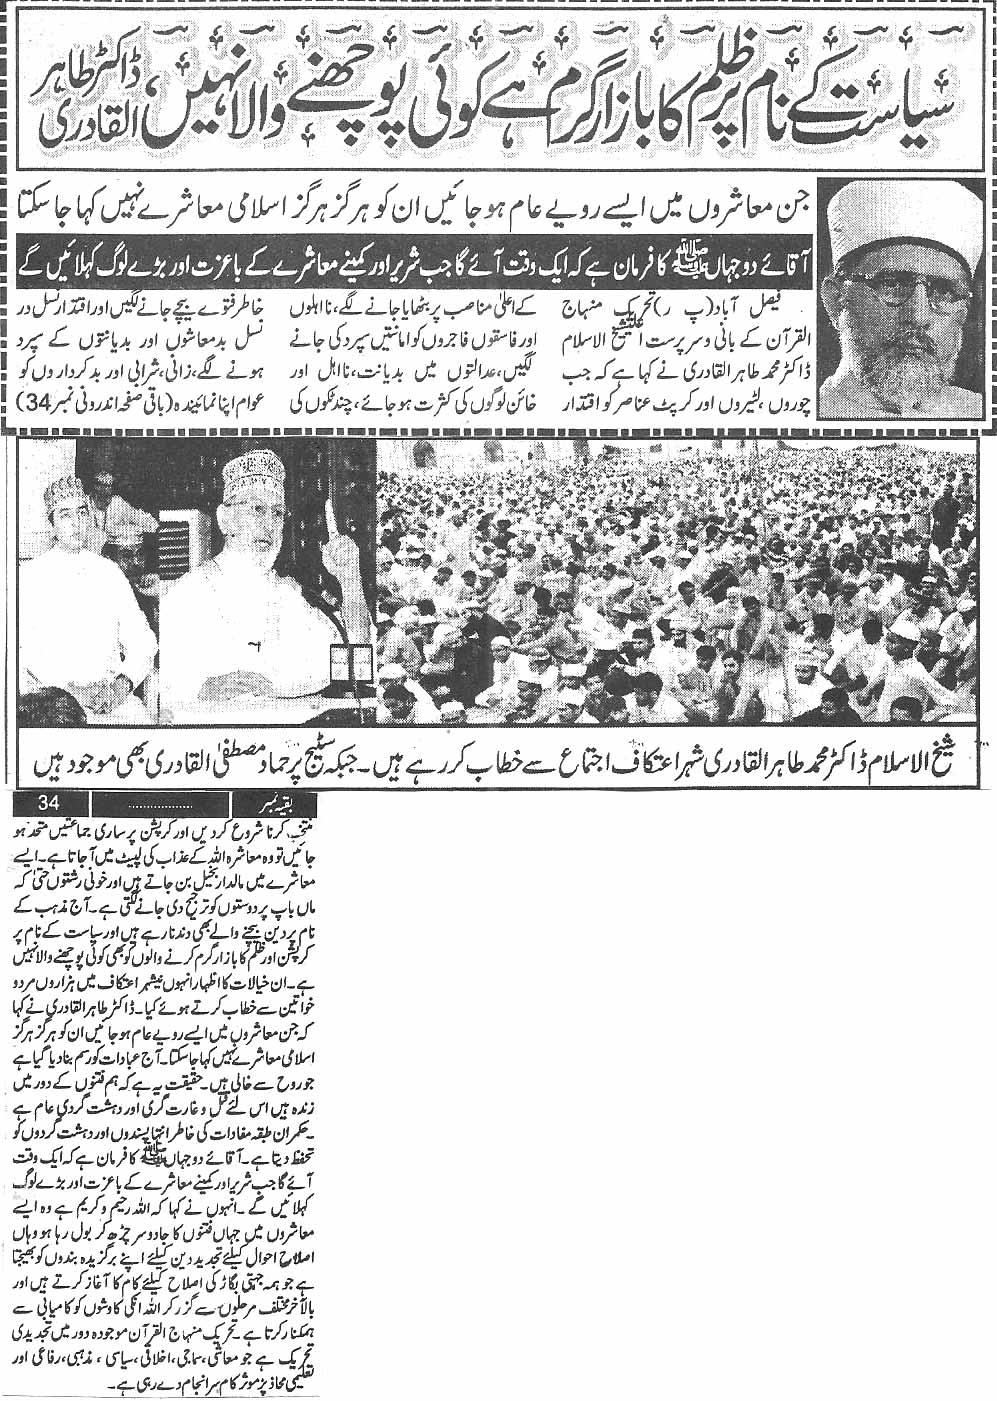 تحریک منہاج القرآن Minhaj-ul-Quran  Print Media Coverage پرنٹ میڈیا کوریج Daily Paigham Back page